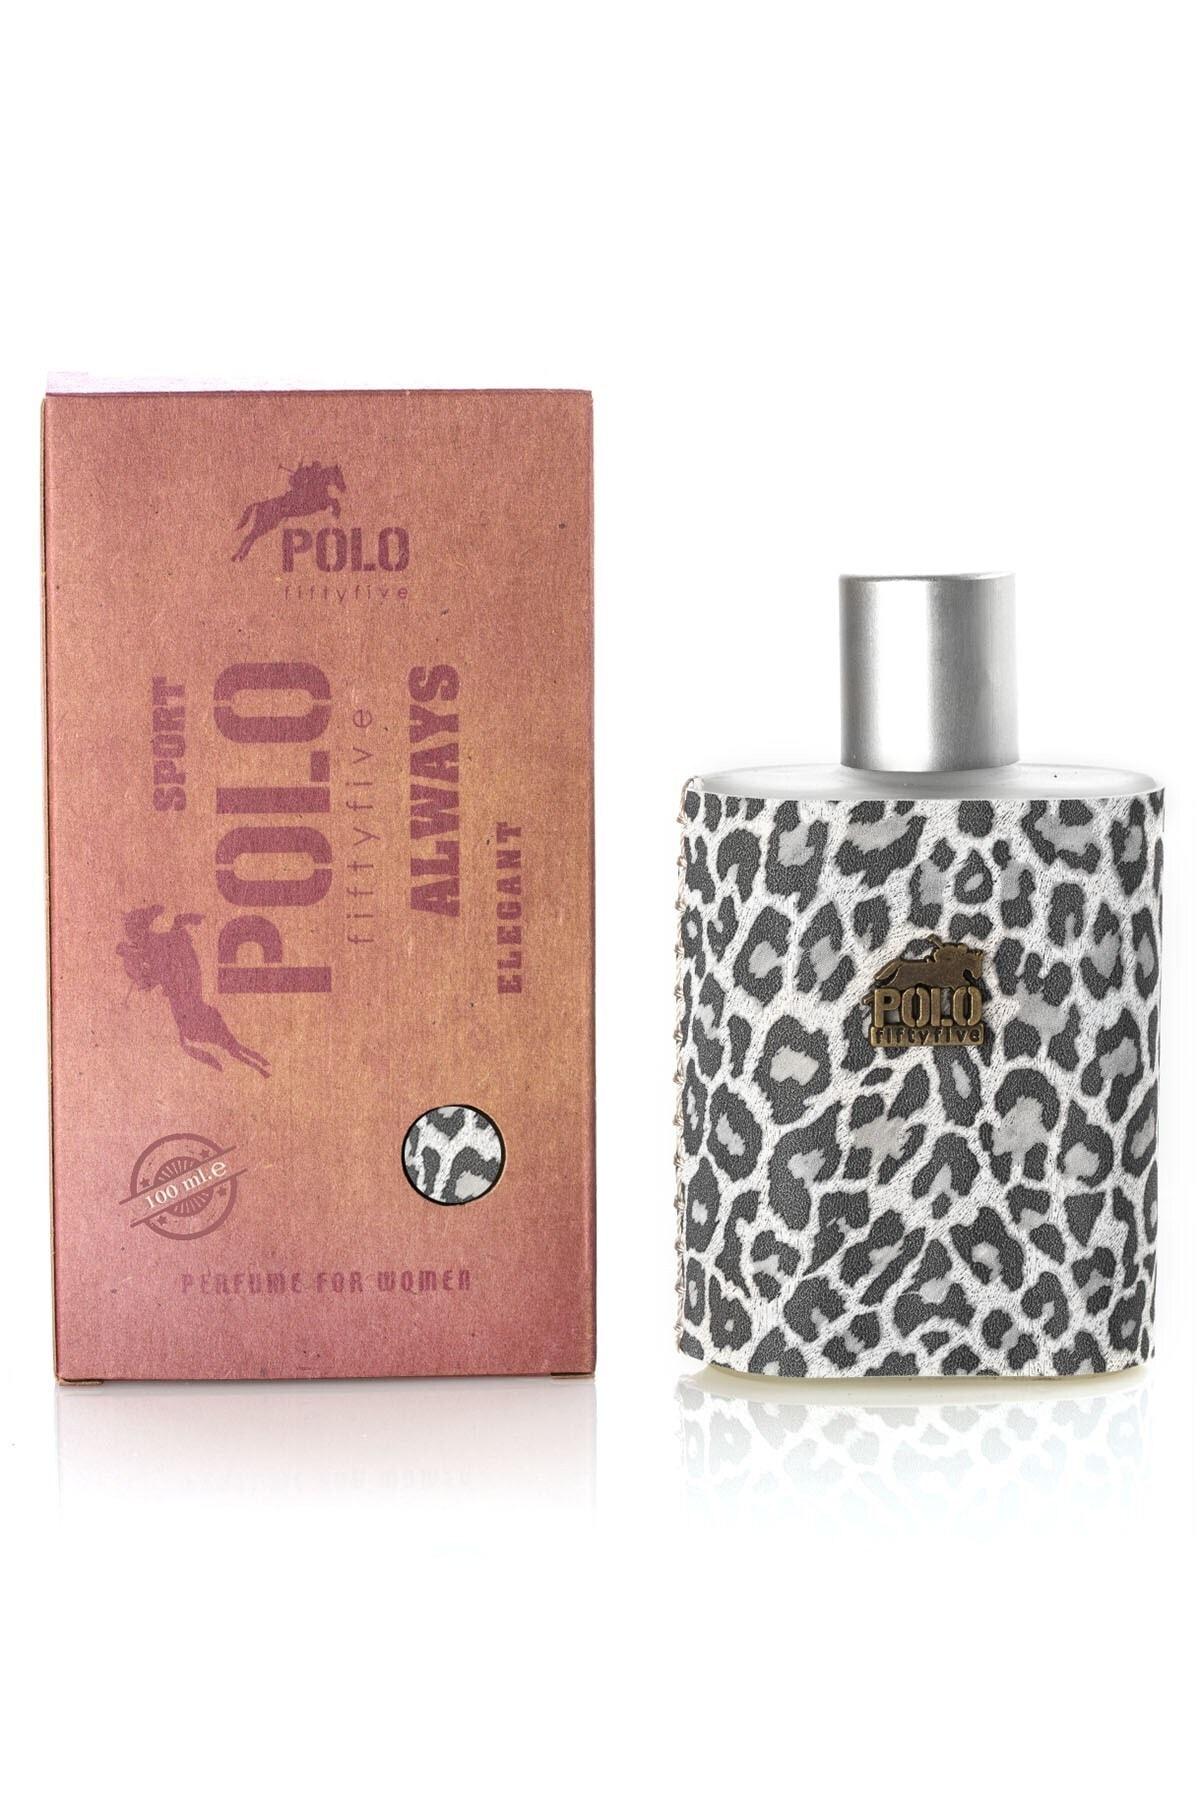 Polo55 P55pw002 Beyaz Kadın Parfüm 1